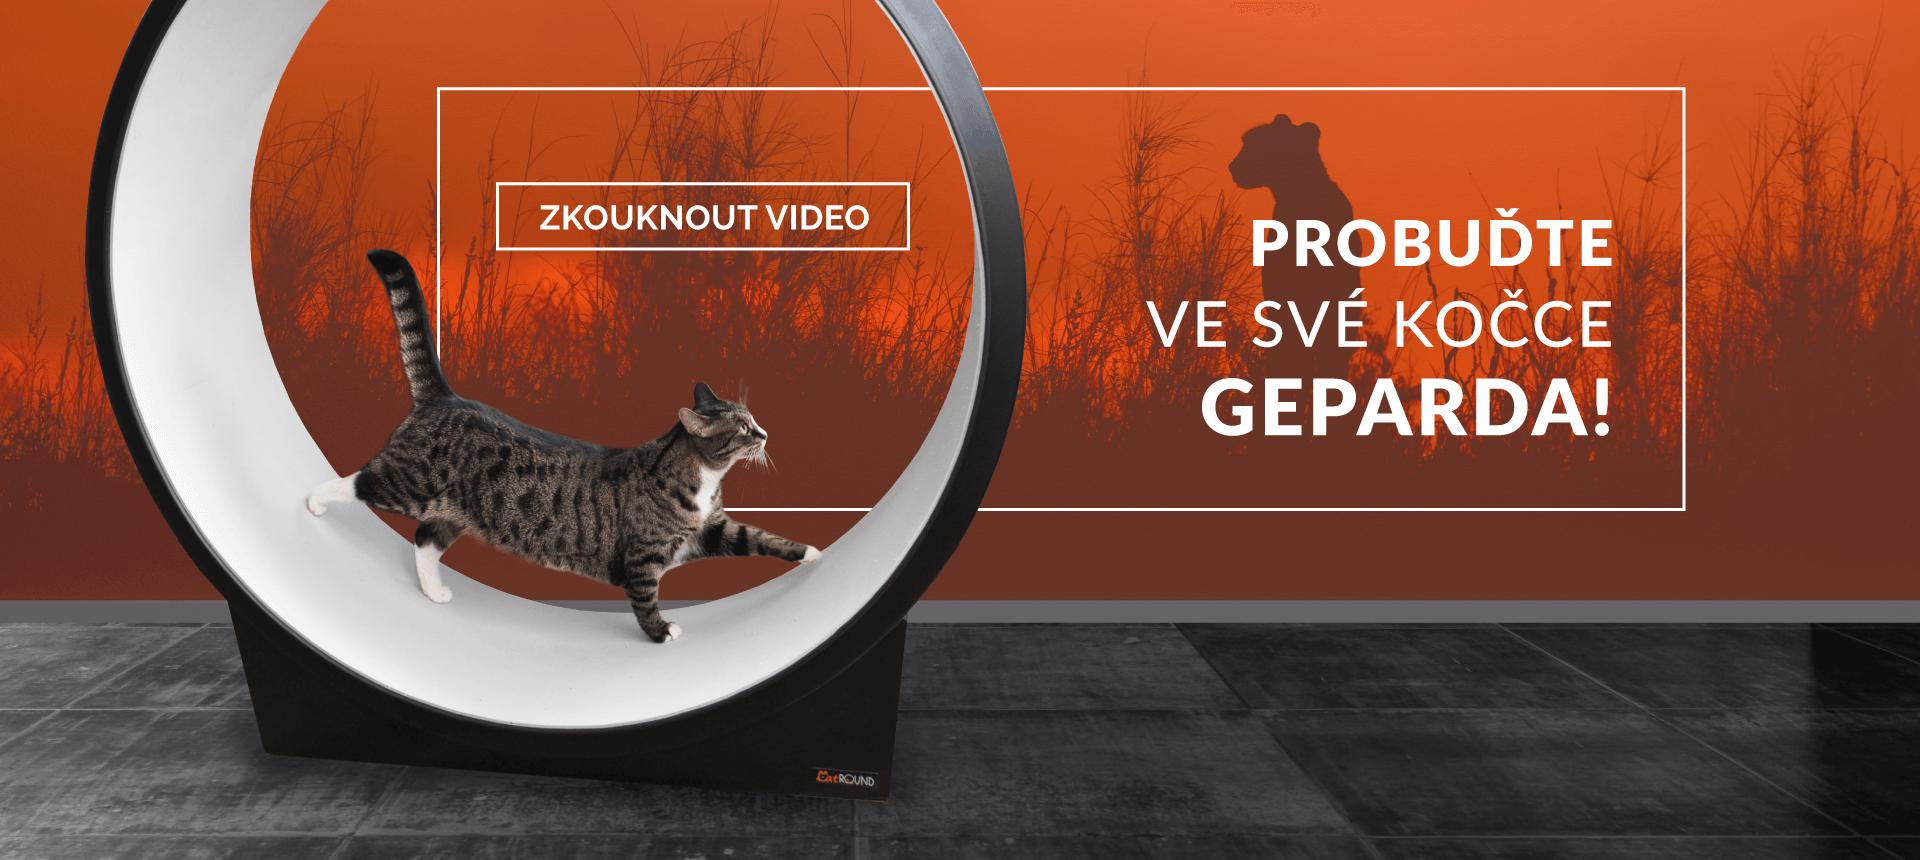 Probuďte ve své kočce geparda